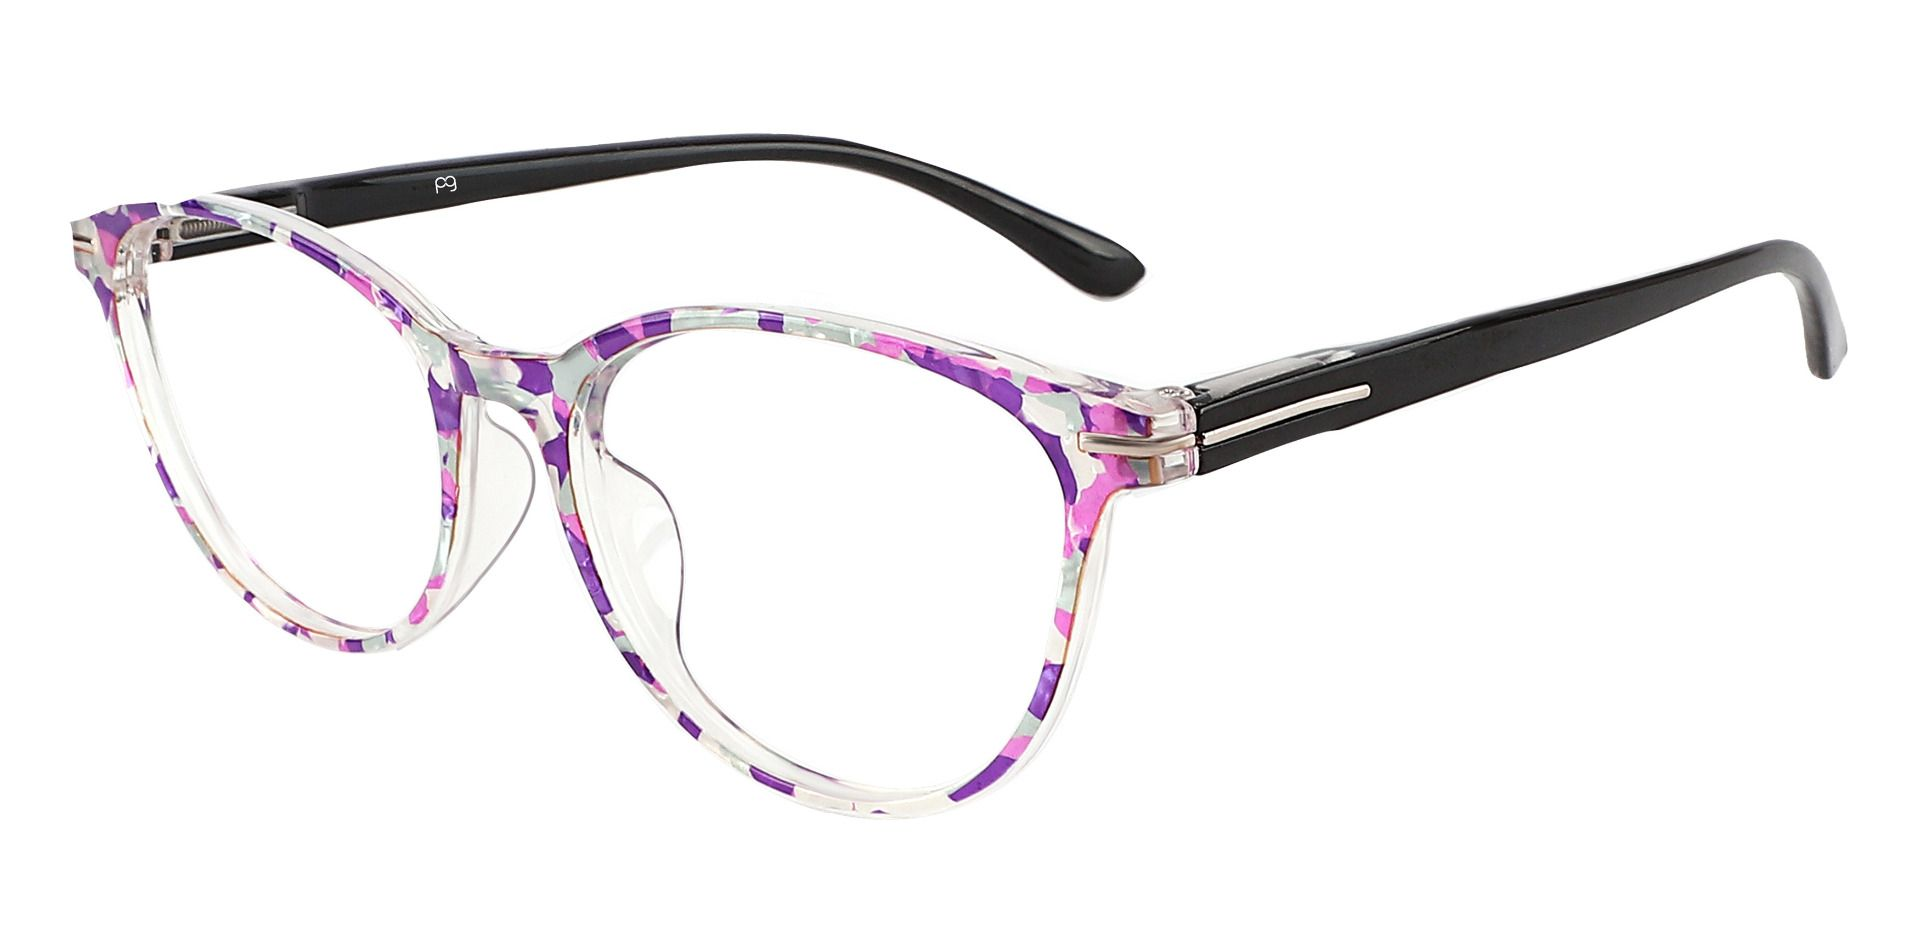 Benton Oval Prescription Glasses - Purple